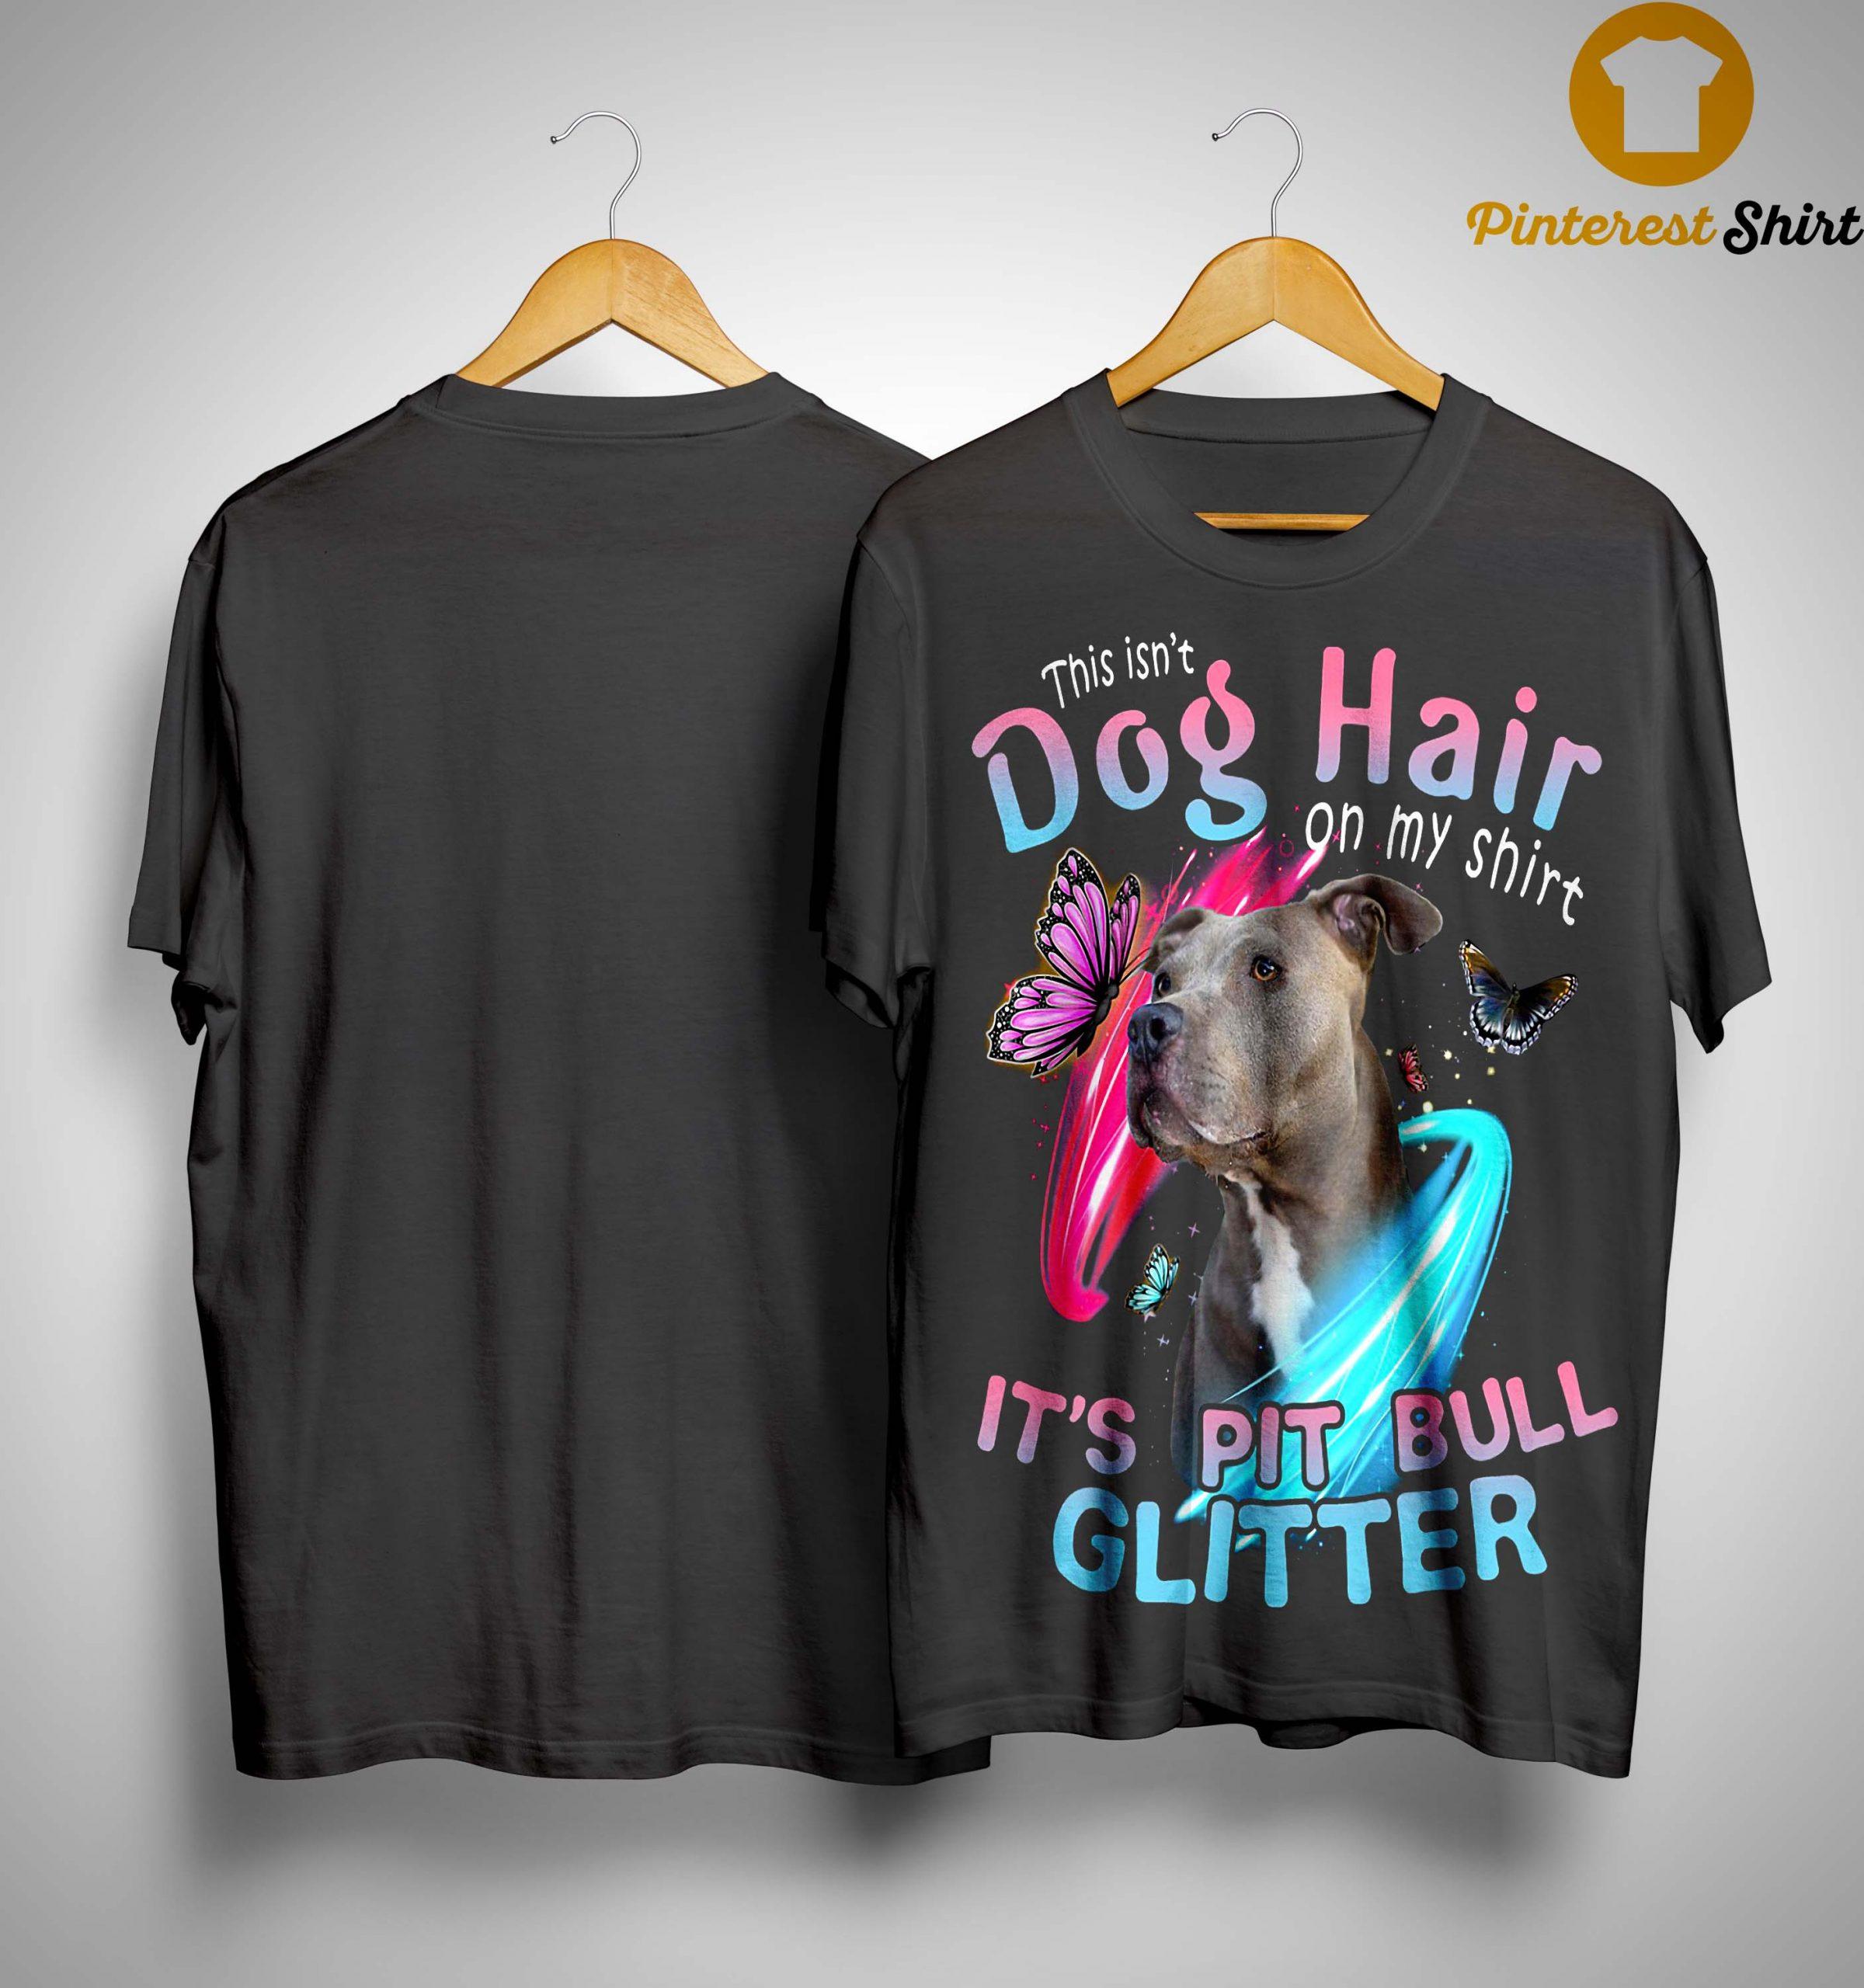 This Isn't Dog Hair On My Shirt It's Pitbull Glitter Shirt